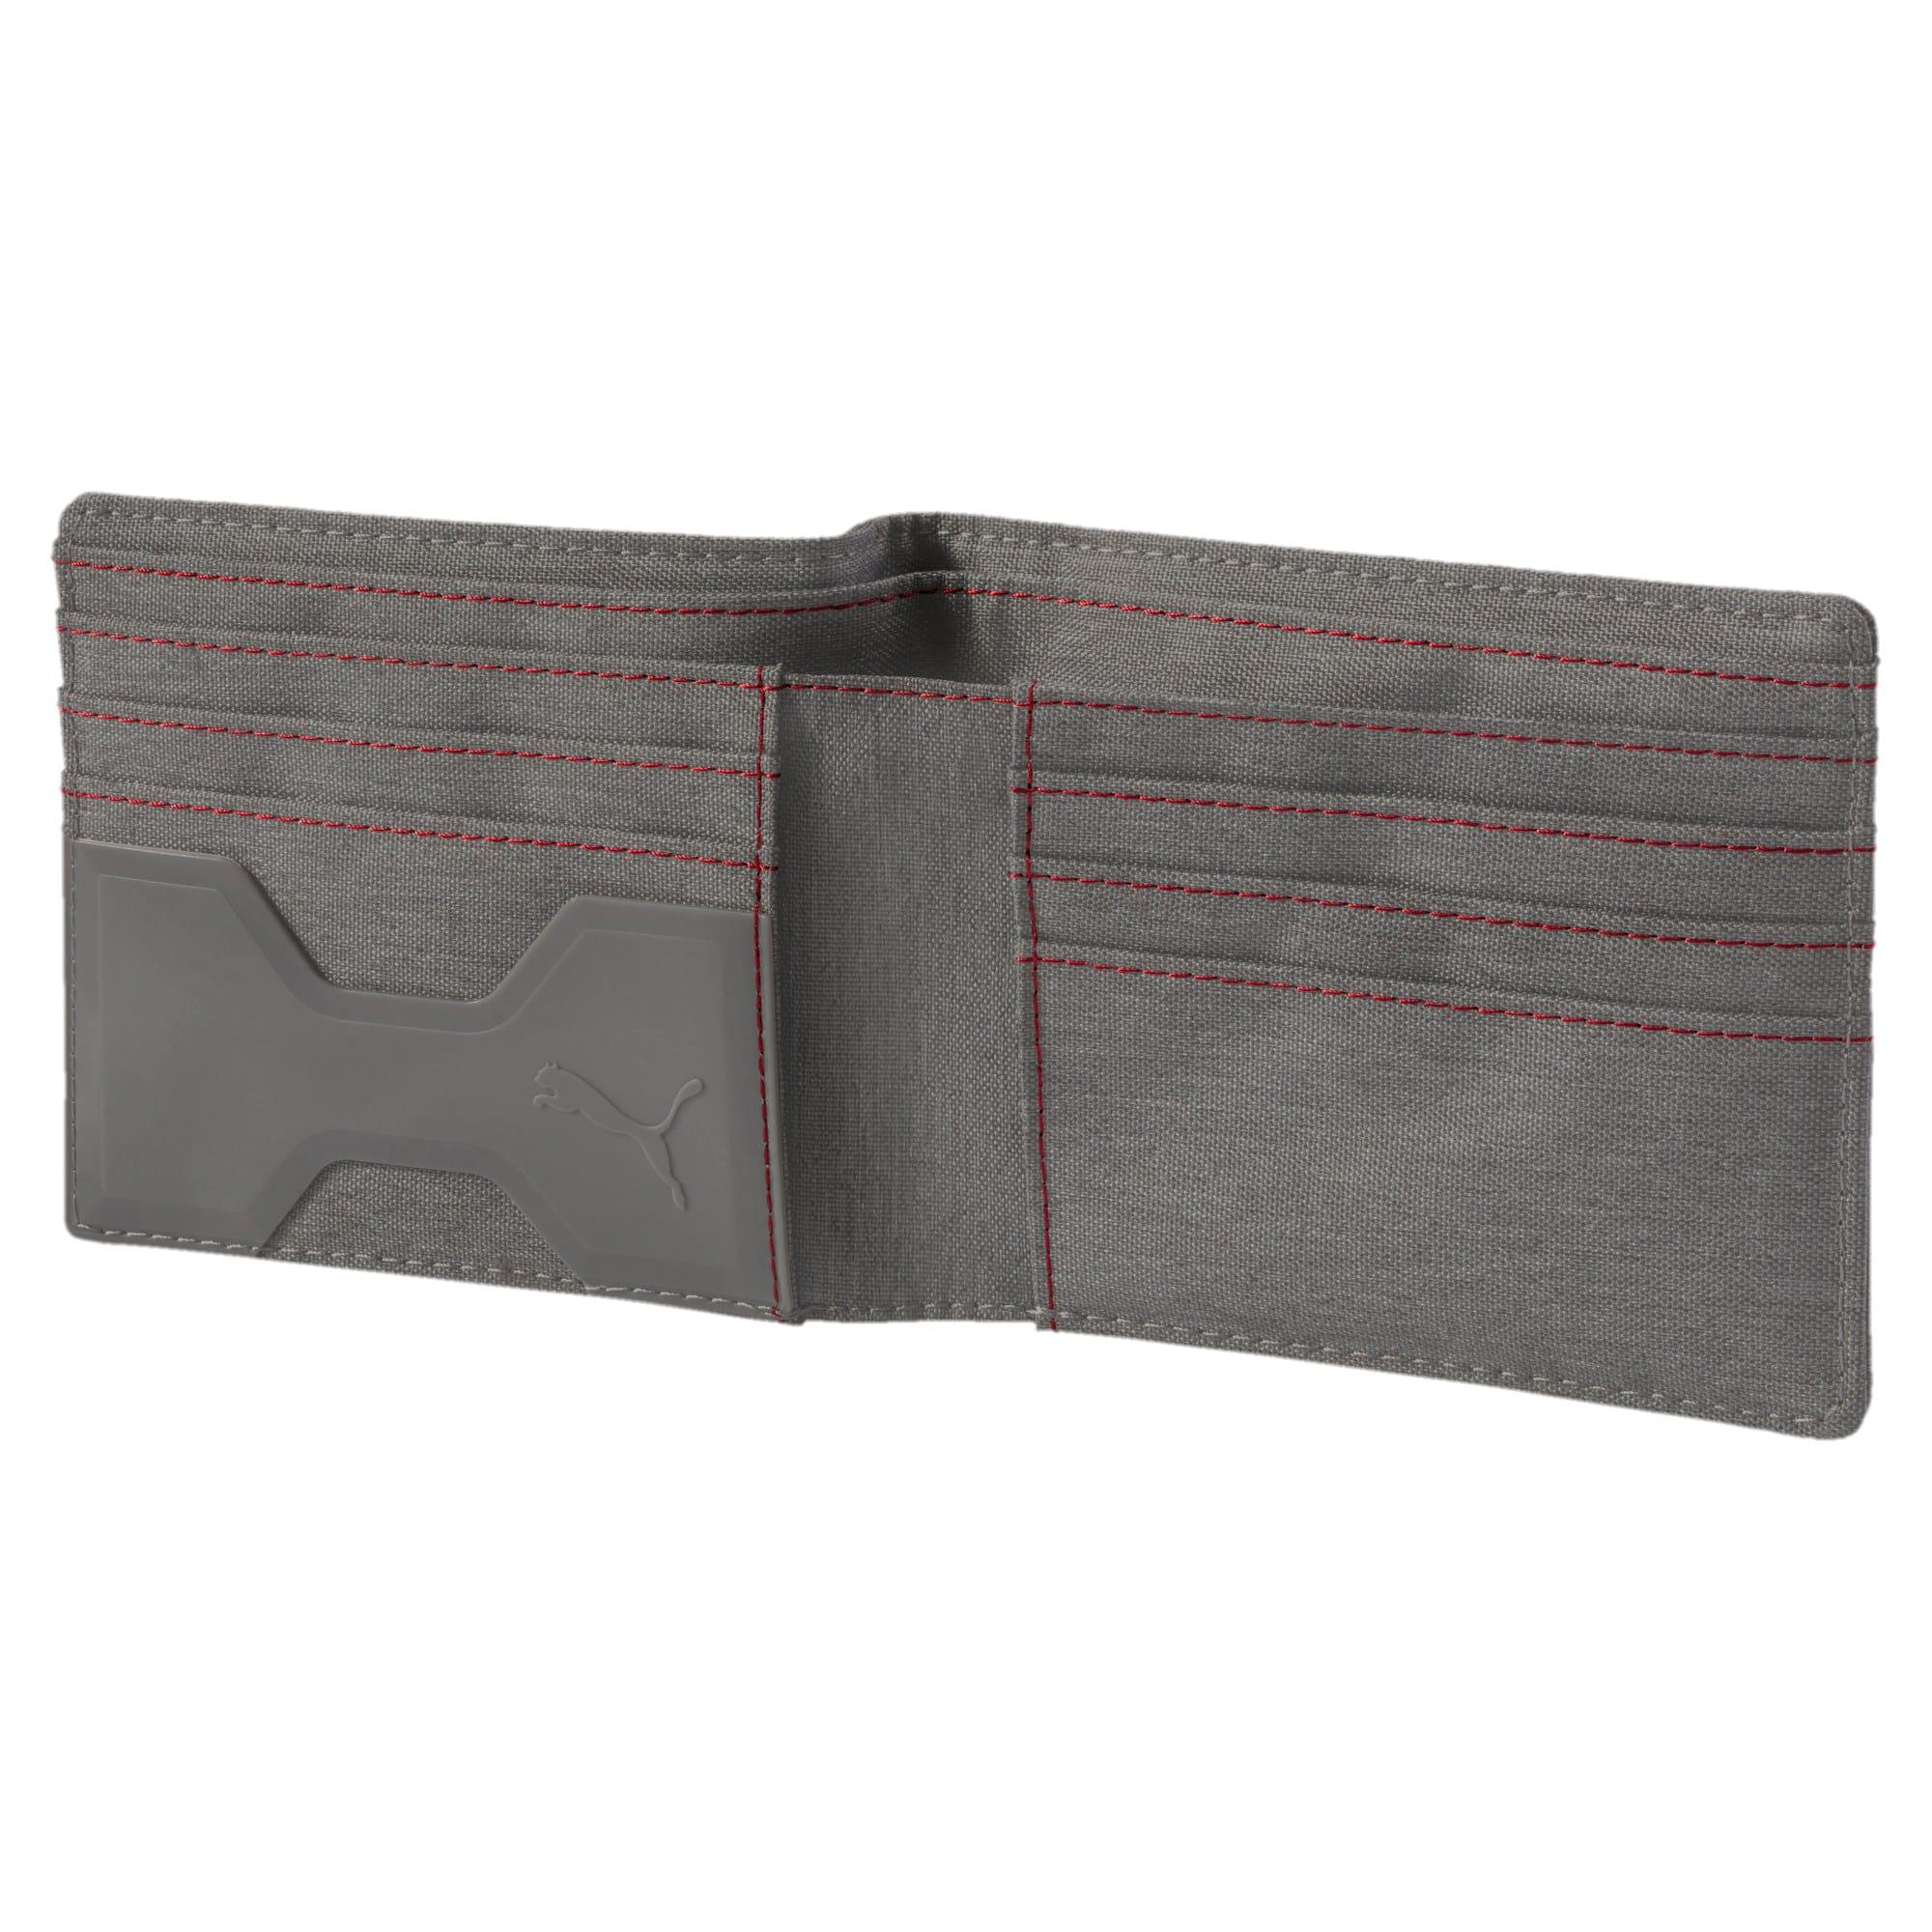 Thumbnail 3 of Scuderia Ferrari Lifestyle Wallet, Charcoal Gray, medium